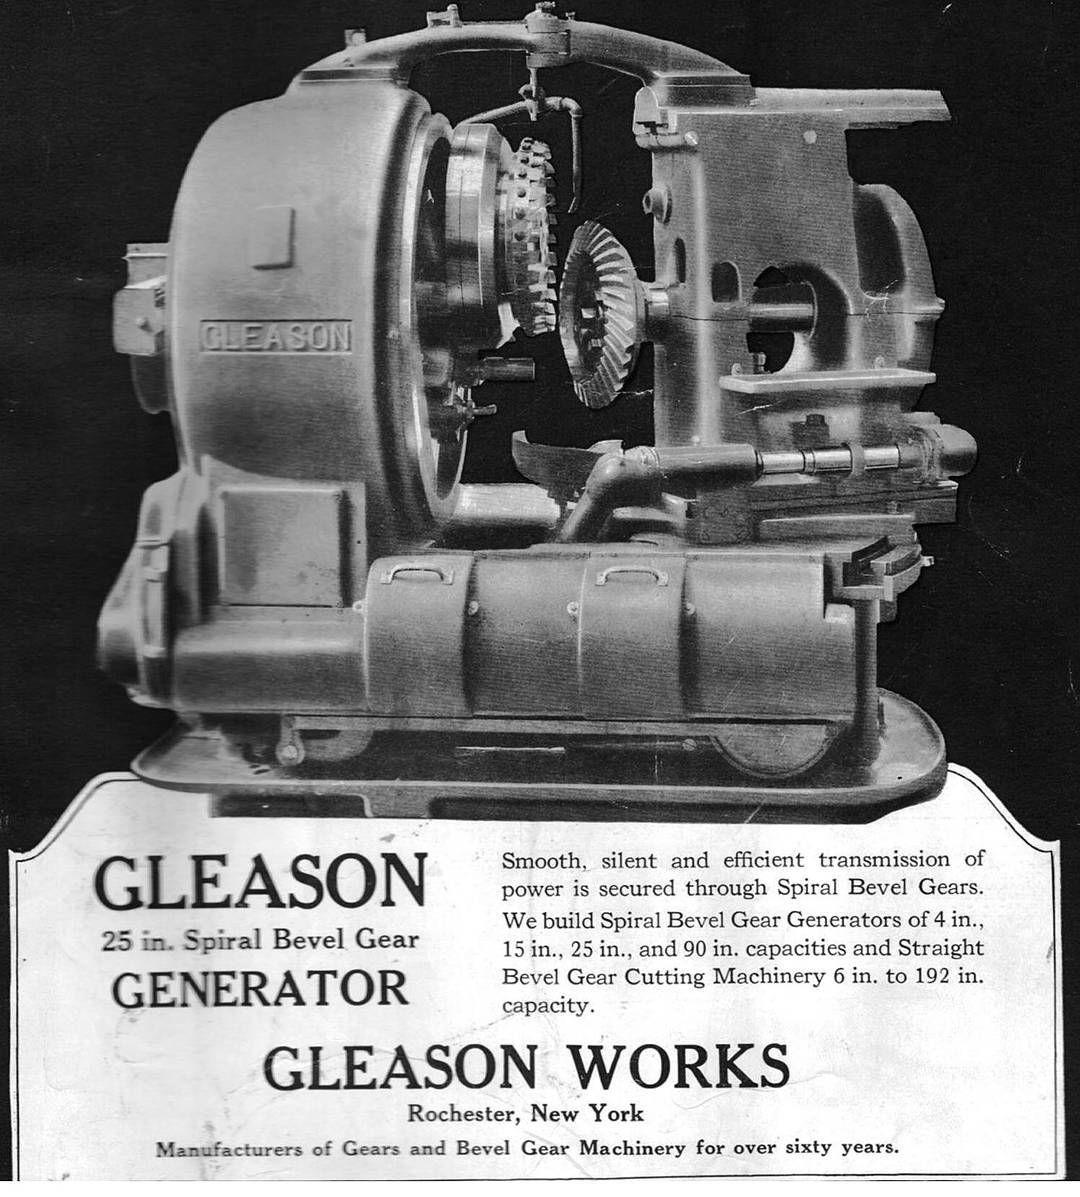 Gleason 25 inch spiral bevel gear generator or cutter